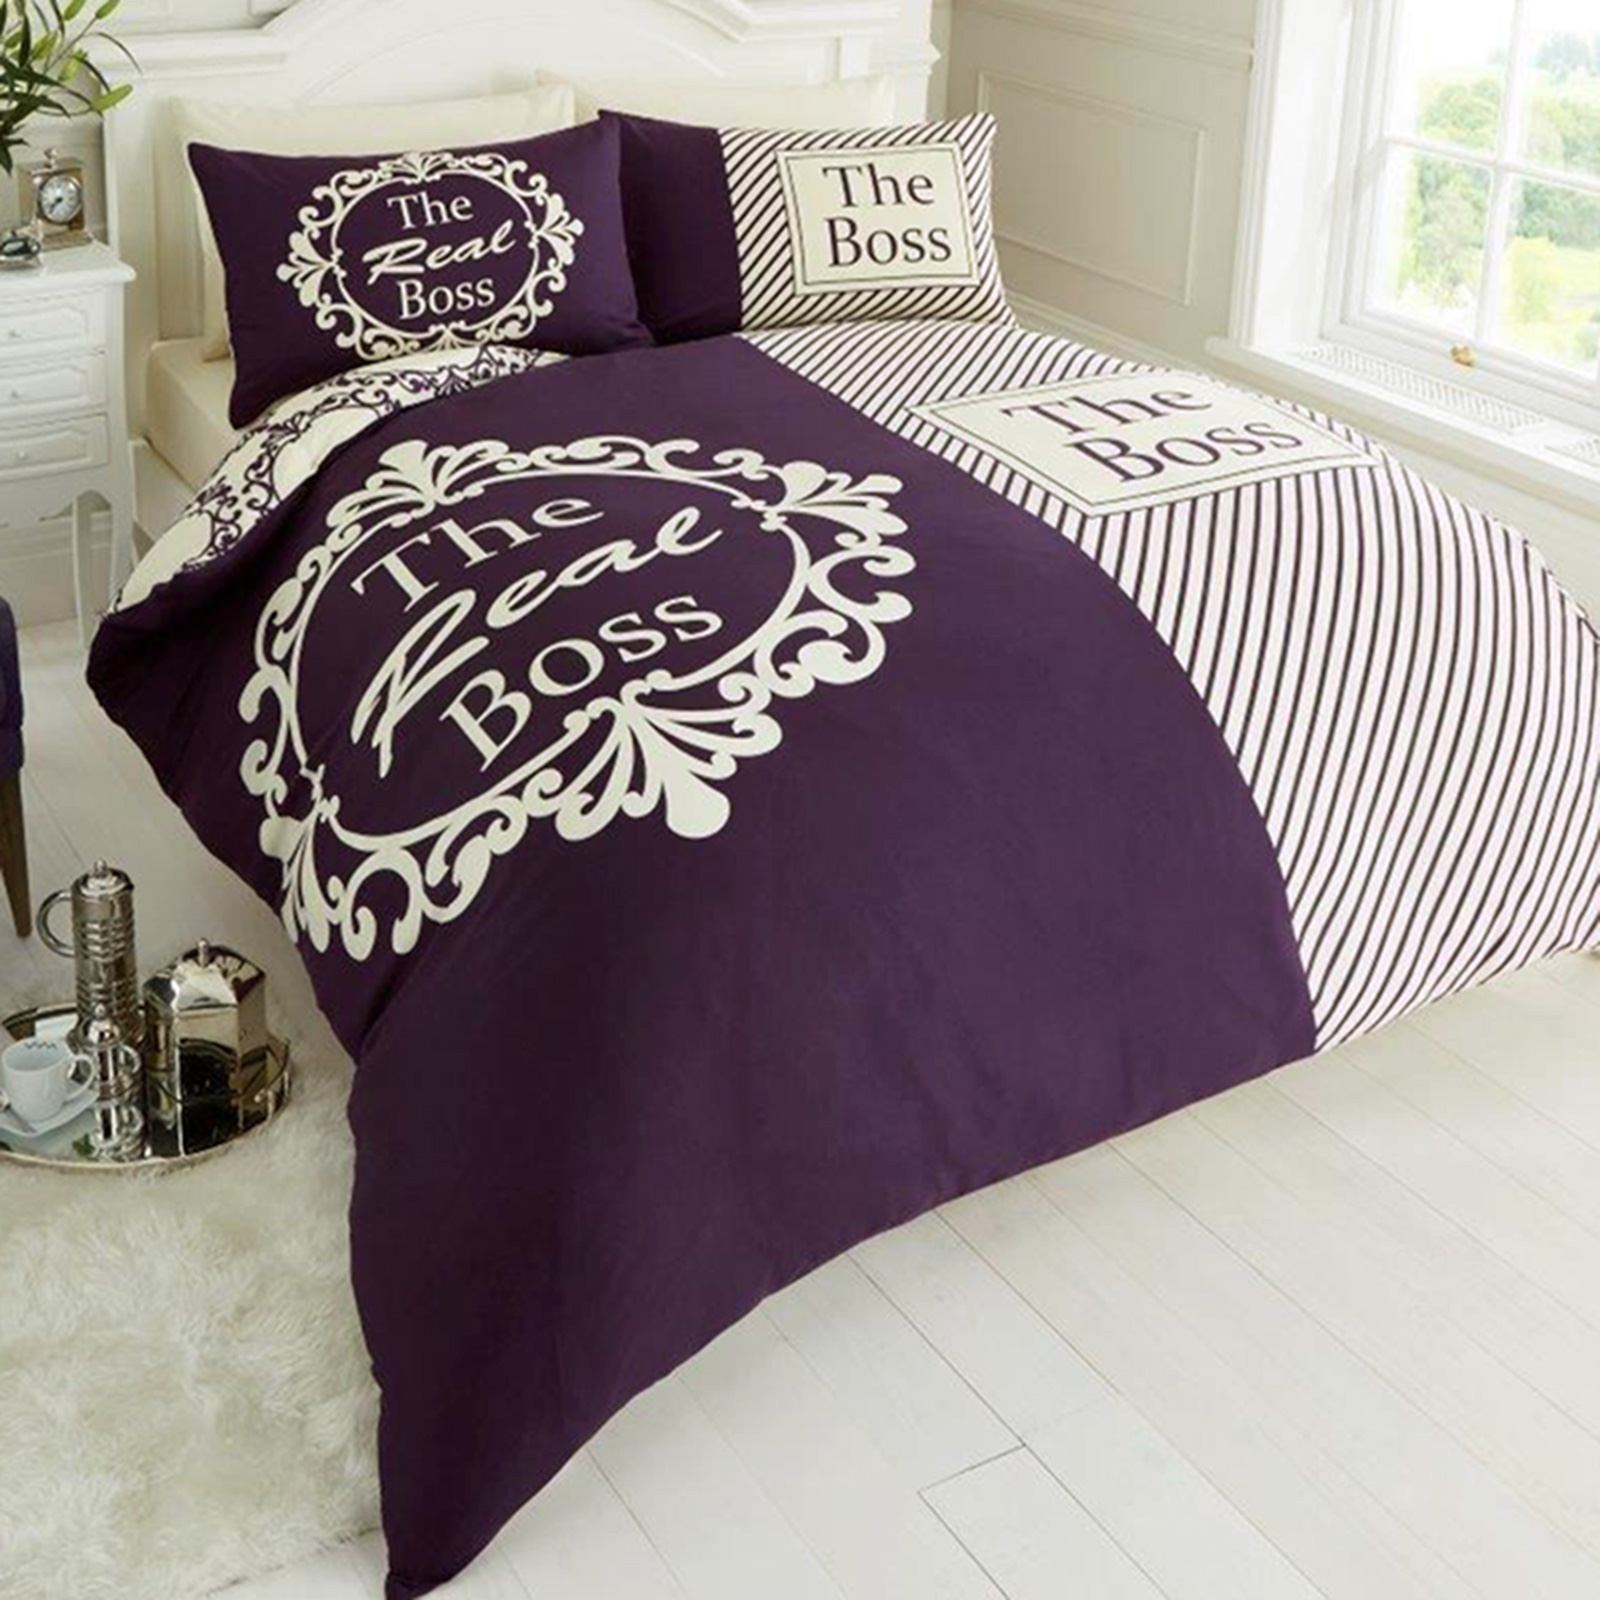 the real boss fun duvet cover  reversible bedding  ebay - the real boss fun duvet cover  reversible bedding